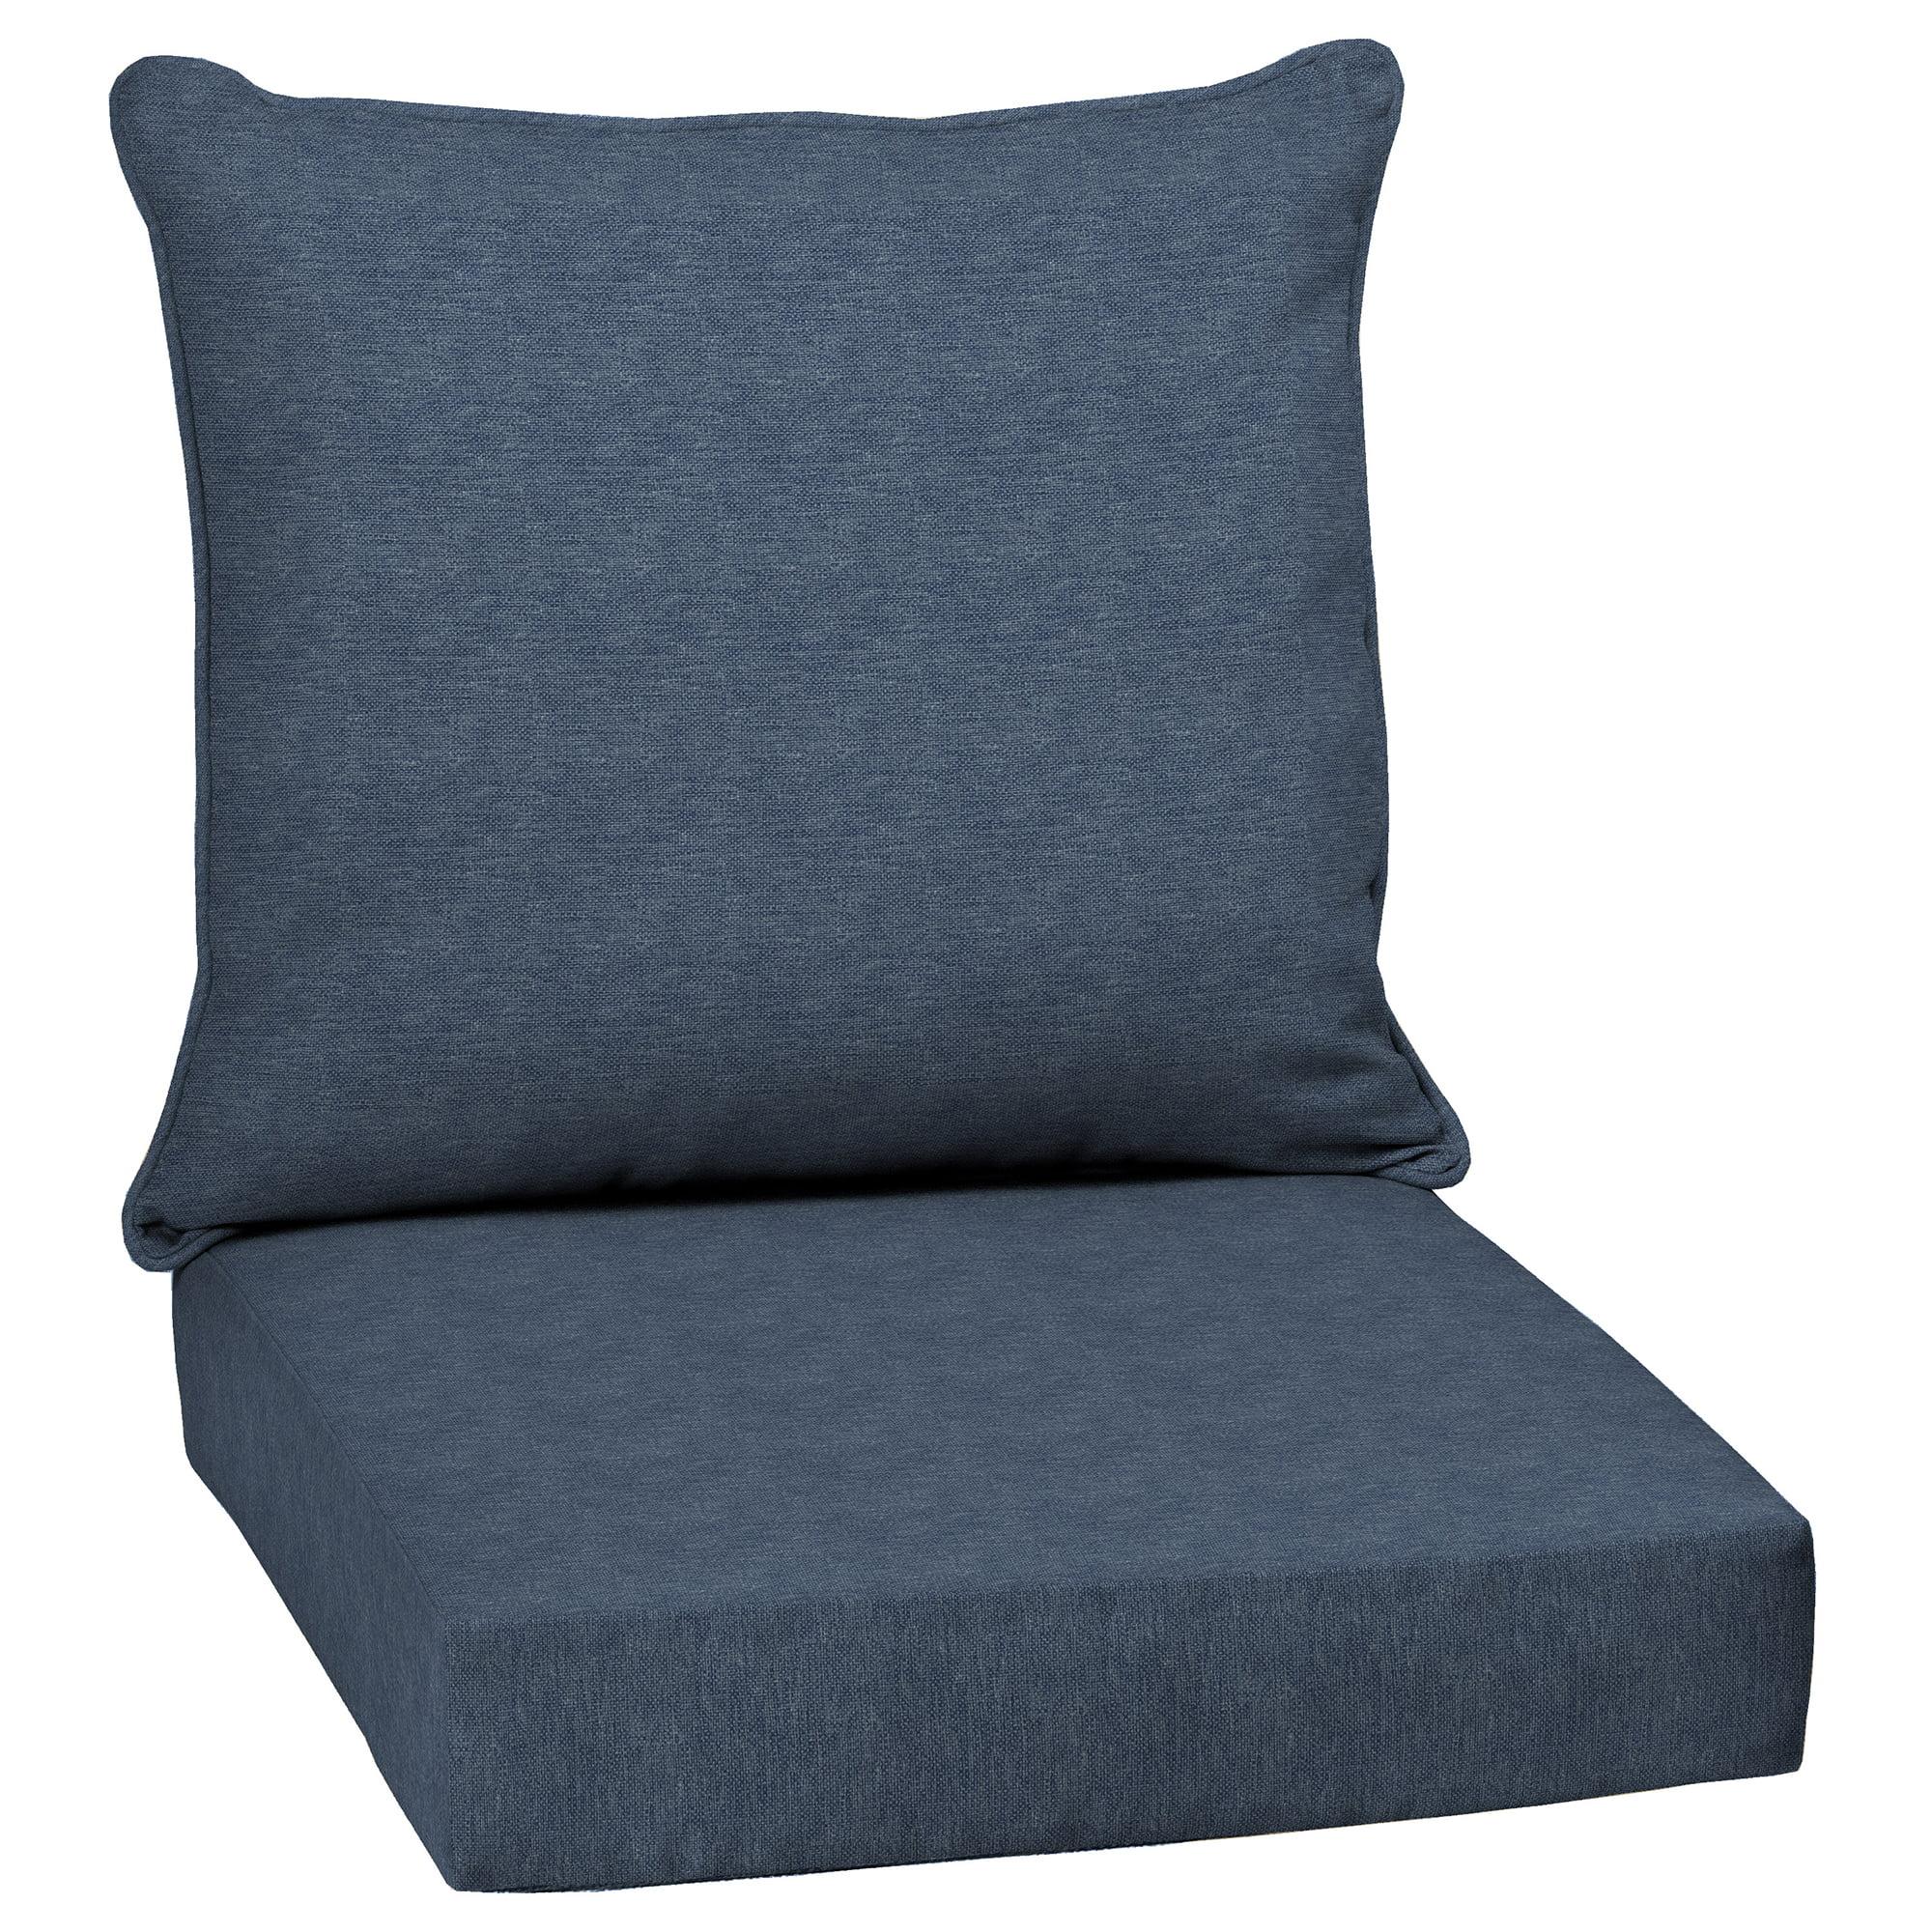 Arden Selections Denim Alair Olefin 46.5 x 24 in. Outdoor Deep Seat Cushion Set